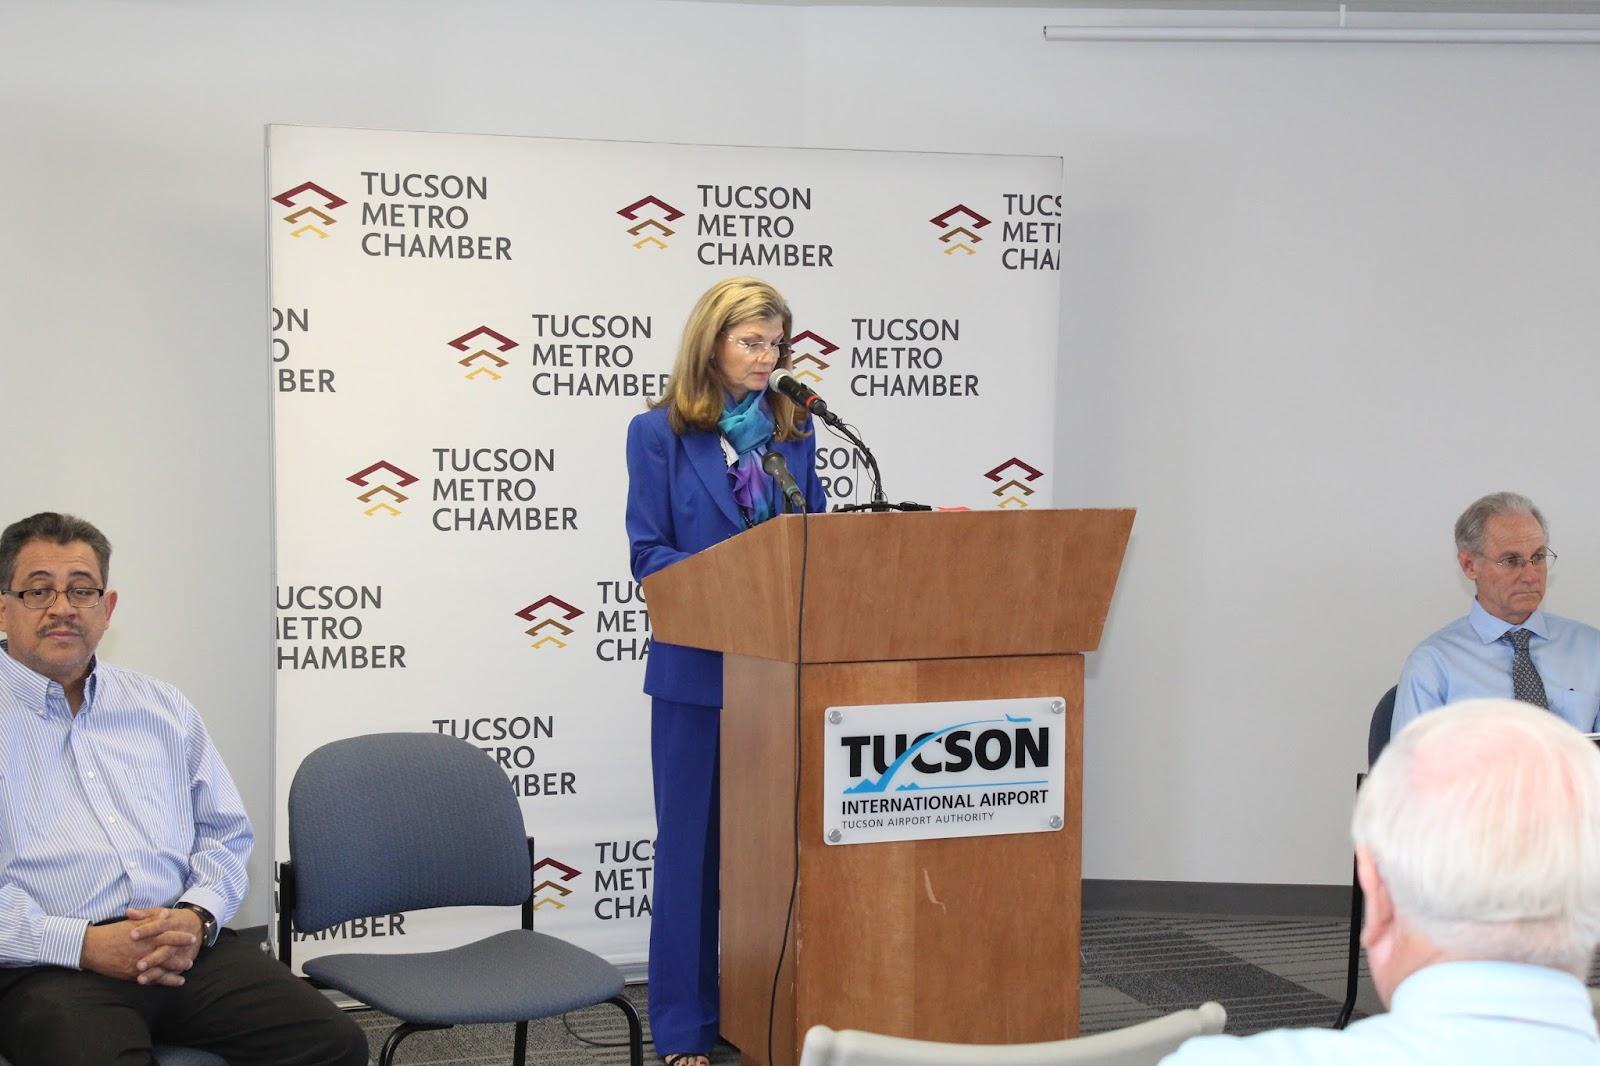 Tucson - JFK Non-Stop Route Announcement - IMG_3155.JPG